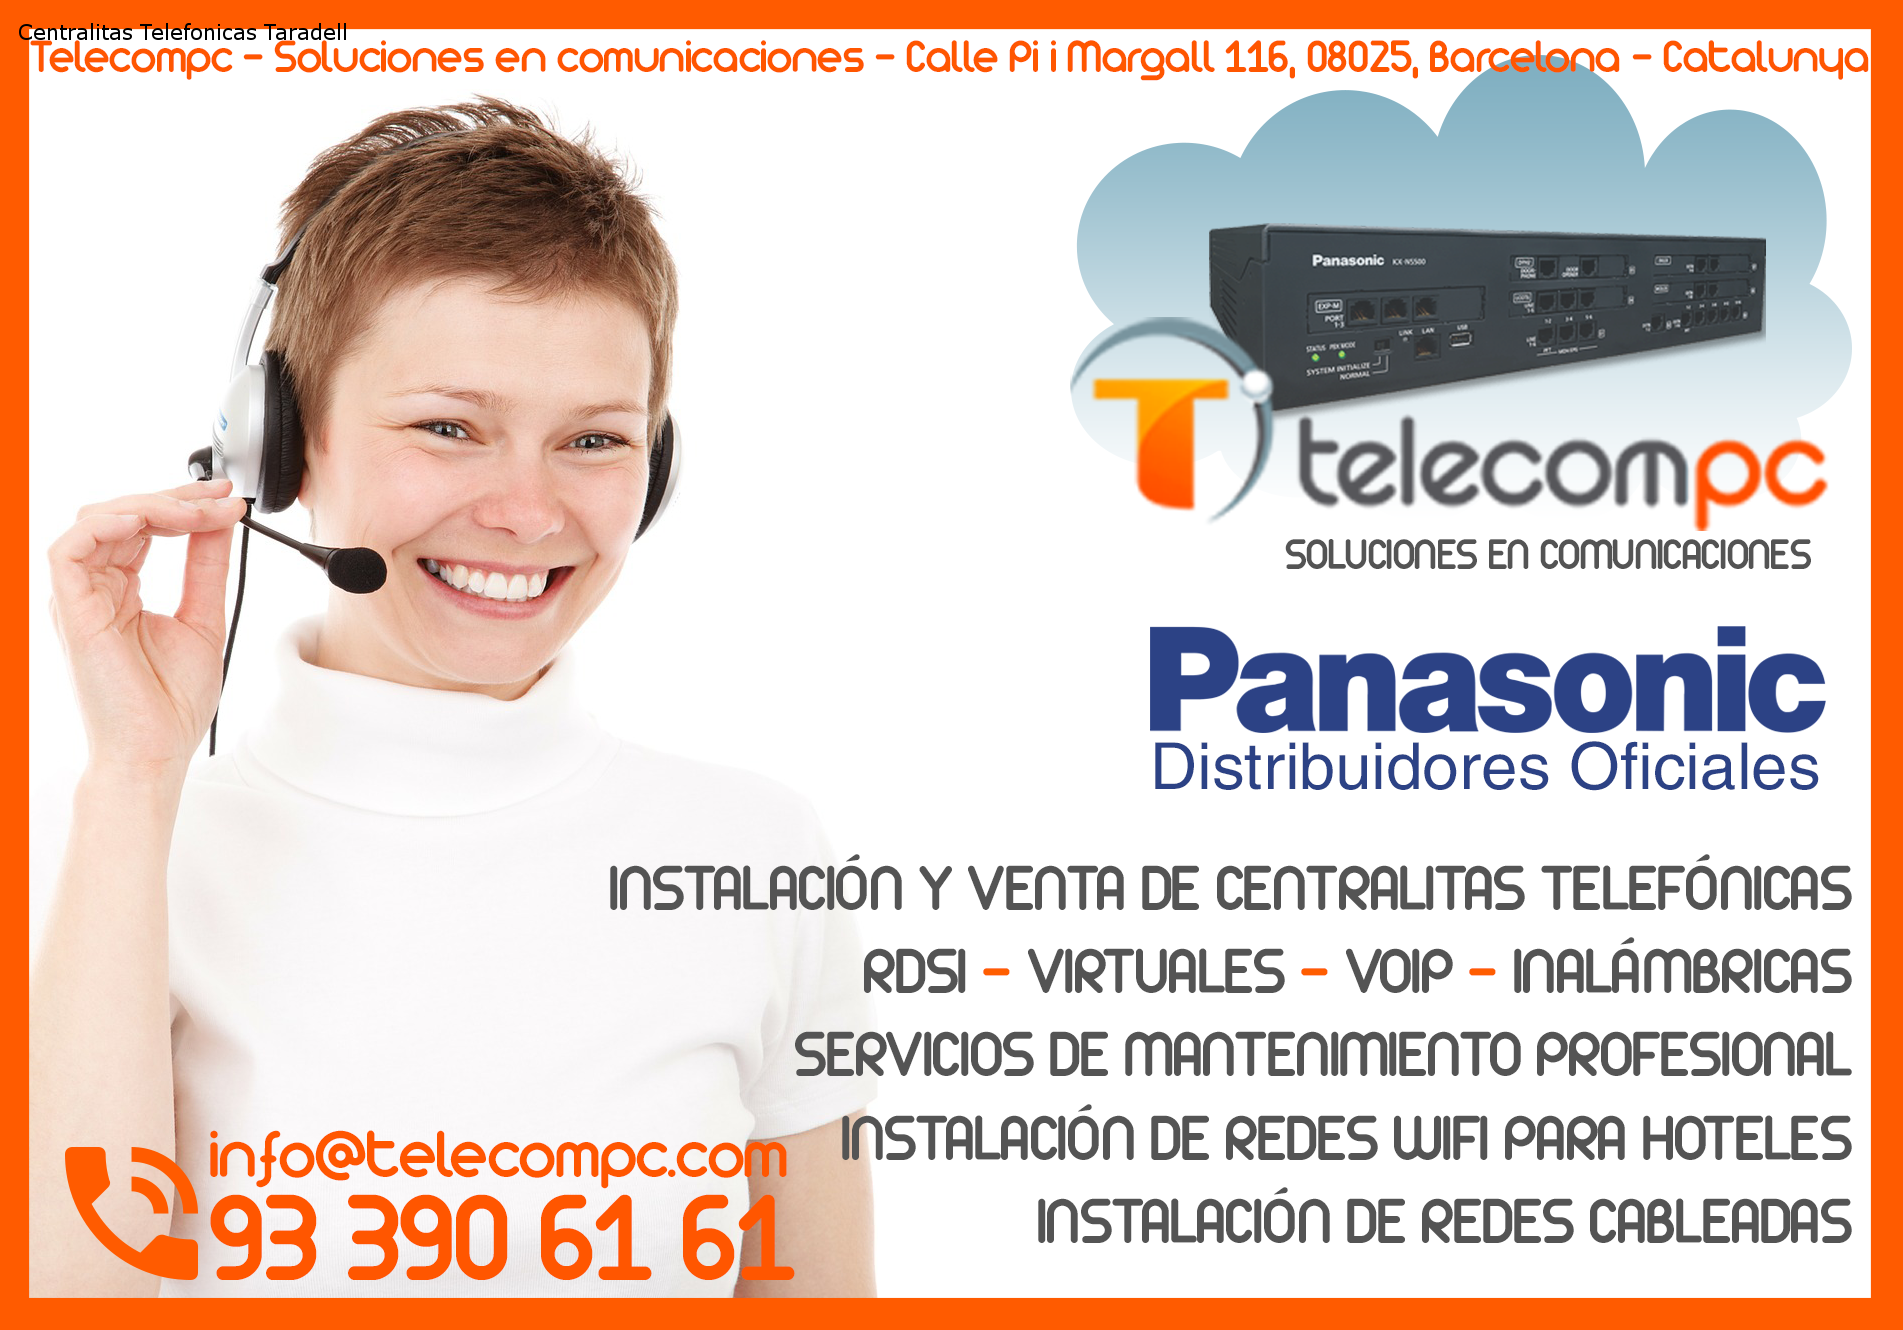 Centralitas Telefonicas Taradell